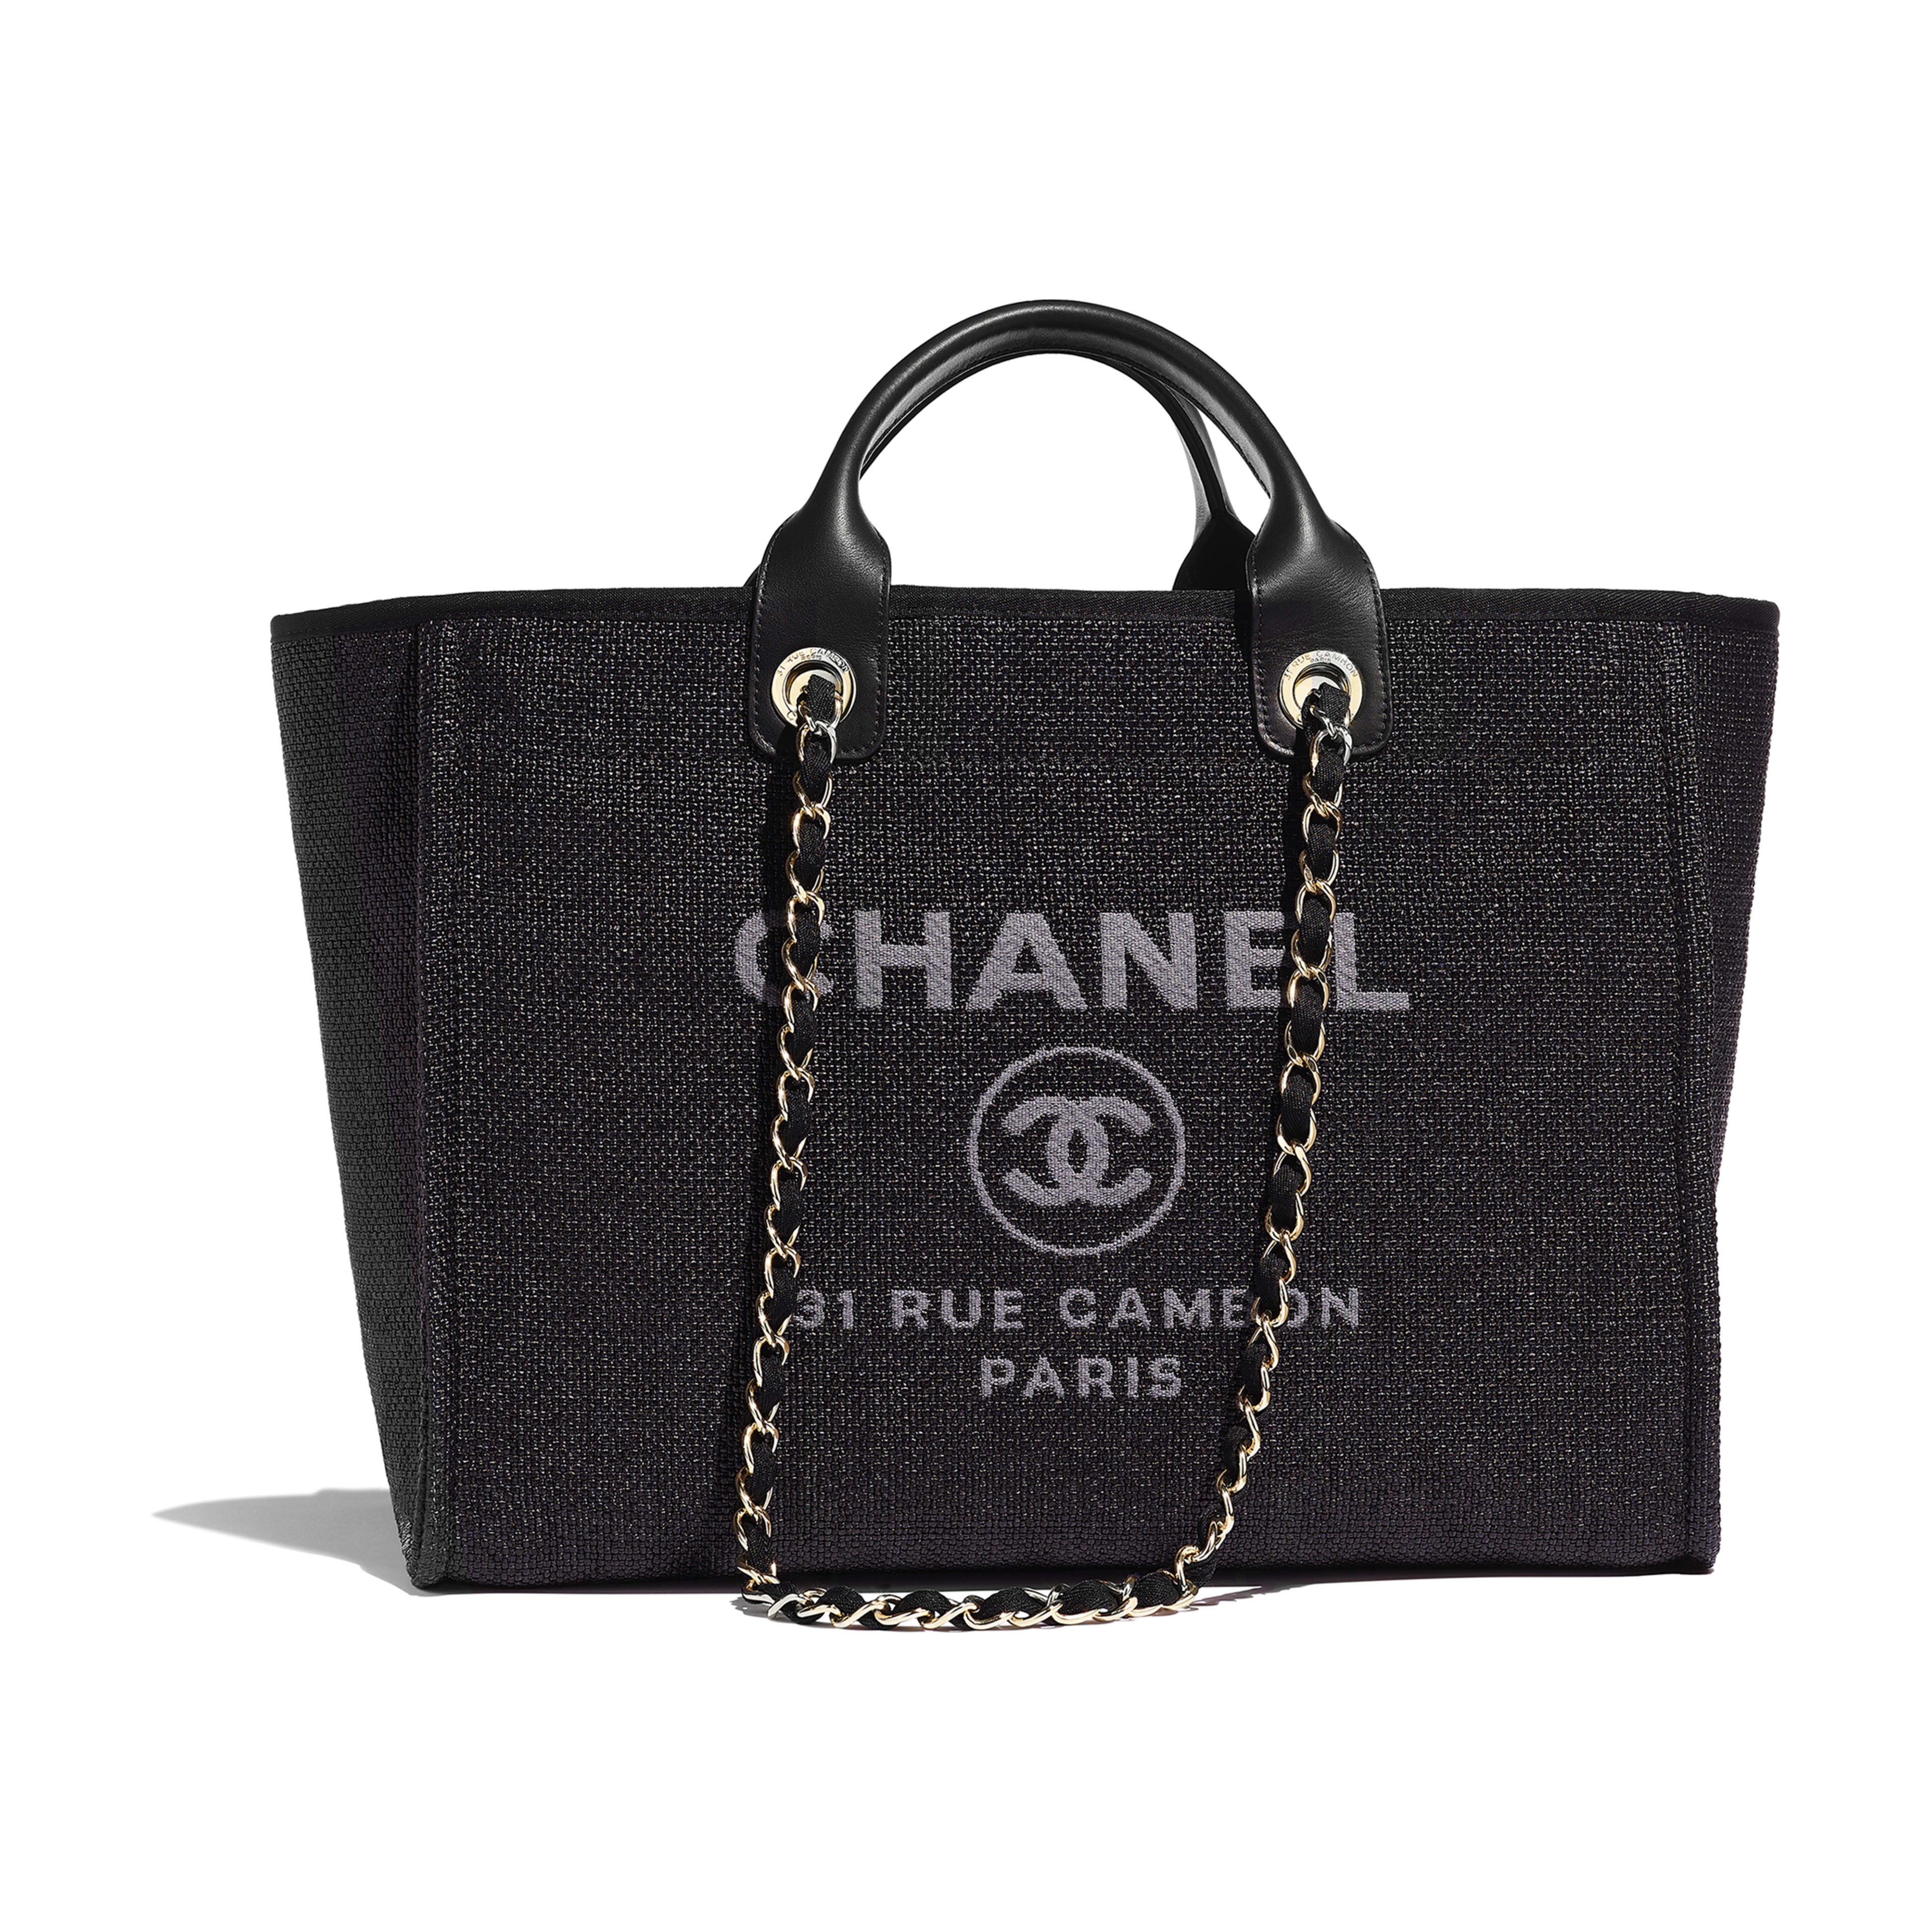 Shopping Bag - Black - Cotton, Nylon, Calfskin & Gold-Tone Metal - Default view - see full sized version